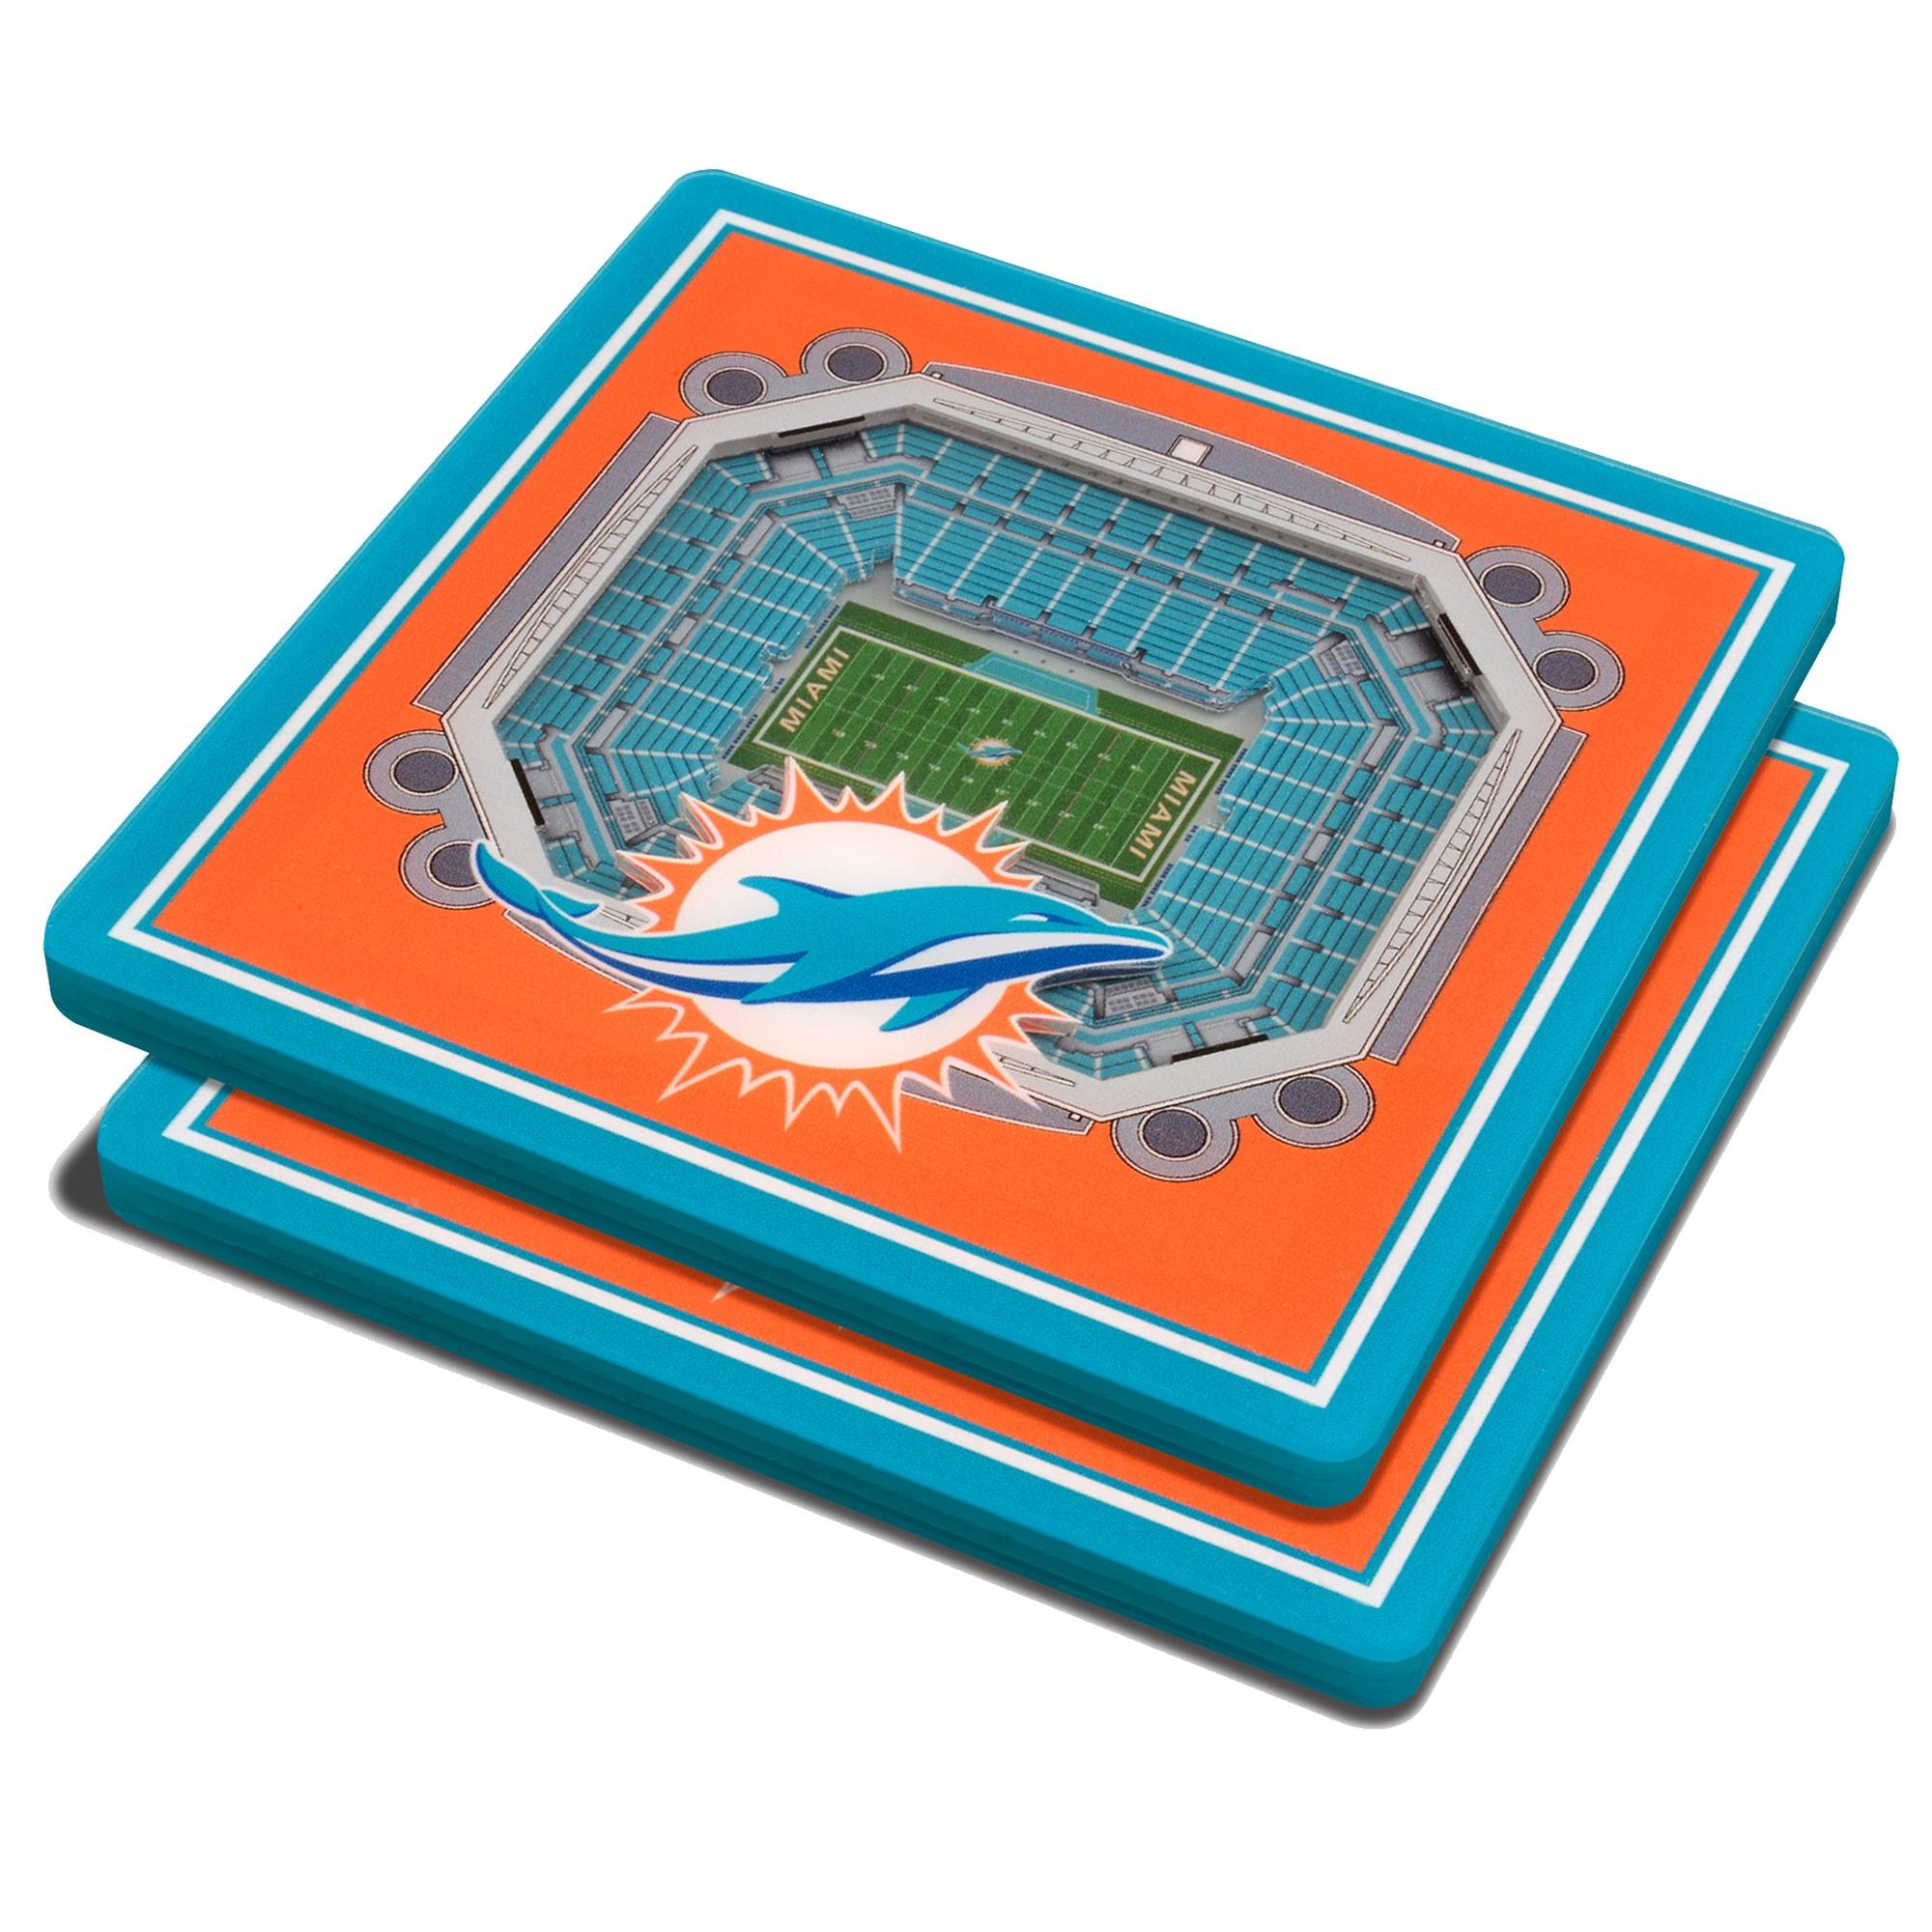 Miami Dolphins 3D StadiumViews Coasters - Orange